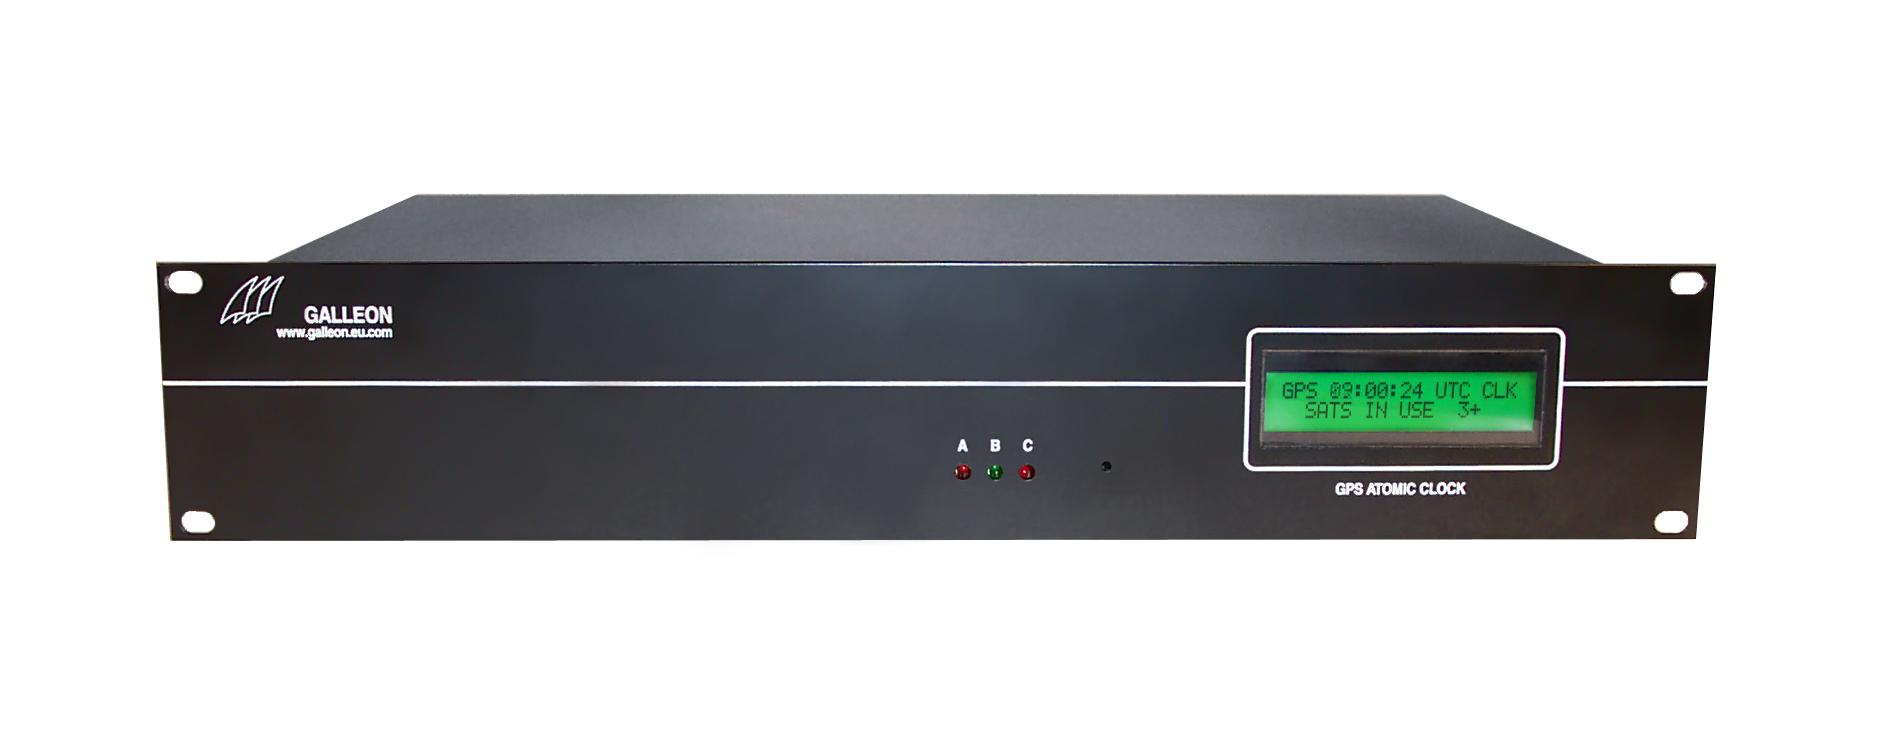 Rack mount 2U GPS Clock and NTP Software